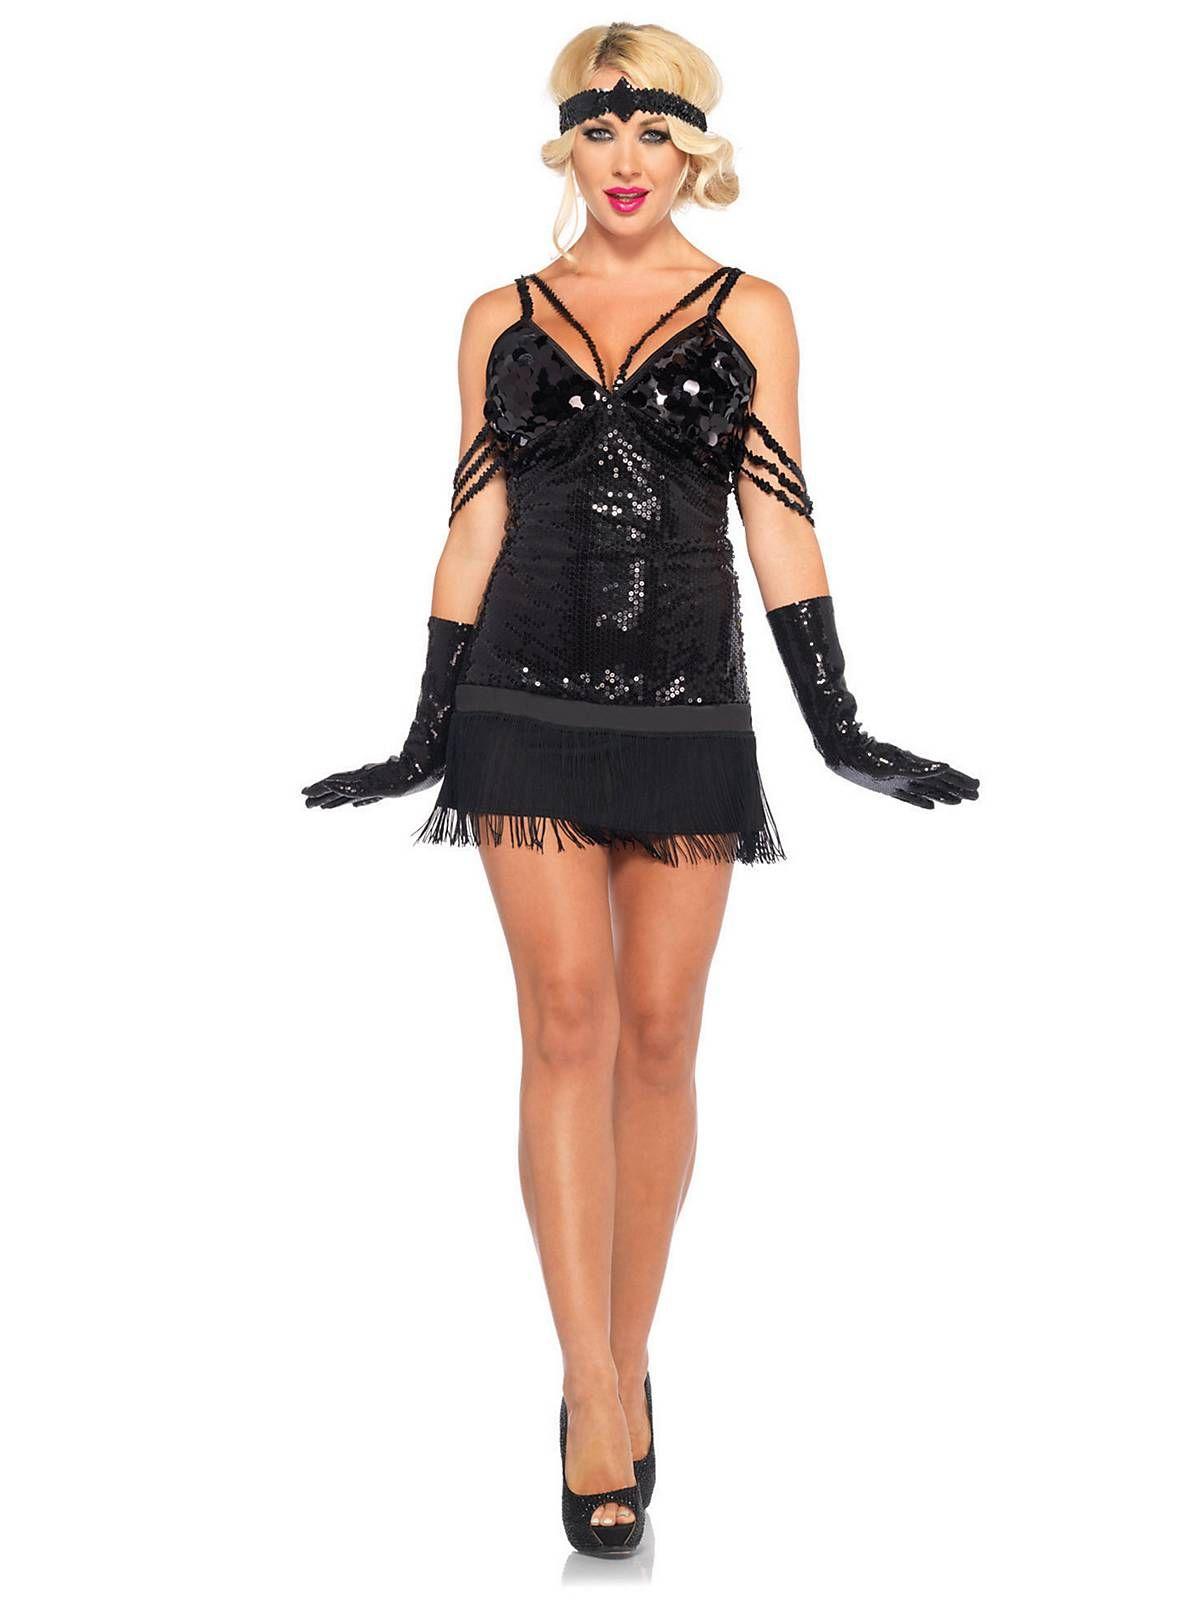 039b949a05 Sexy Glam Flapper Costume